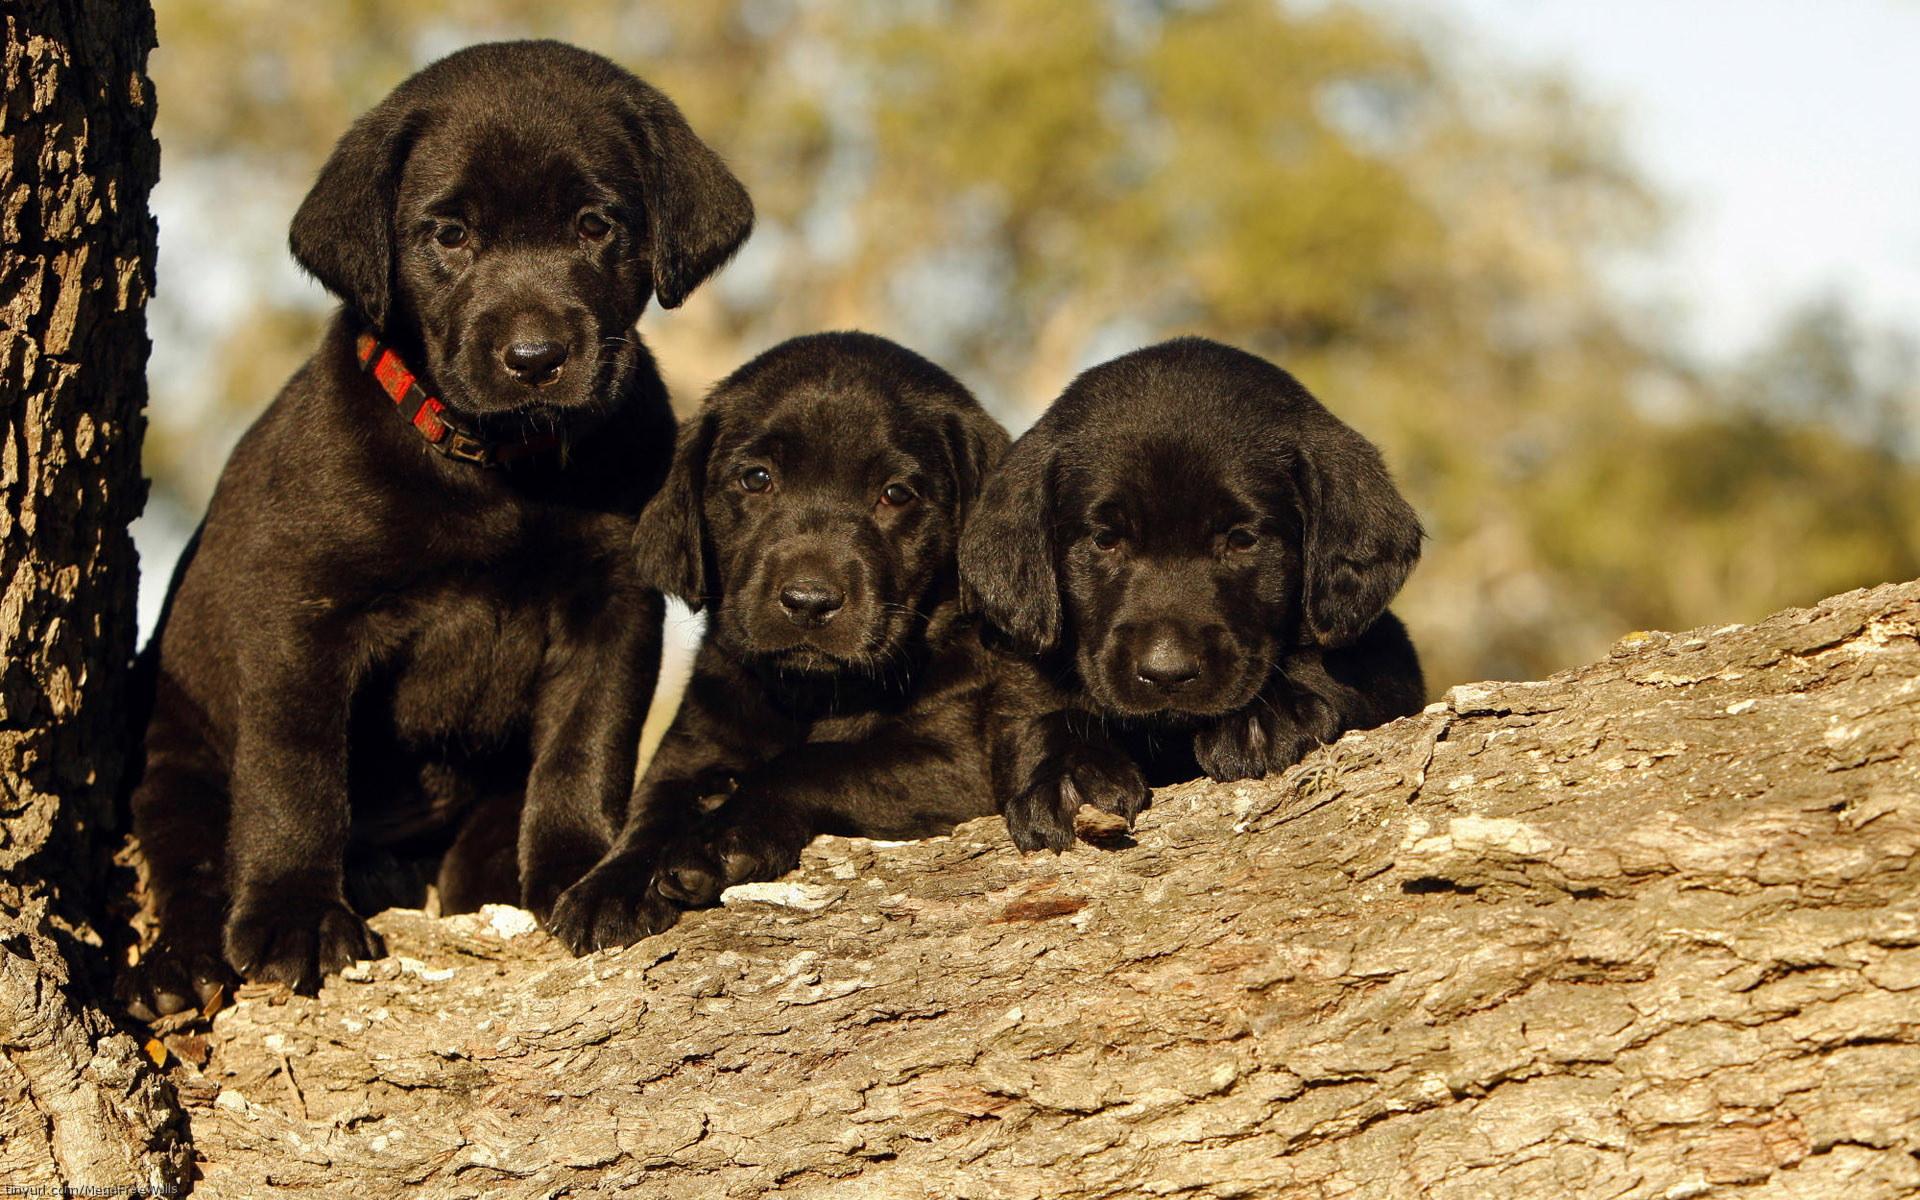 Black Labrador Puppy HD Wallpaper Download HD Wallpapers for Desktop 1920x1200